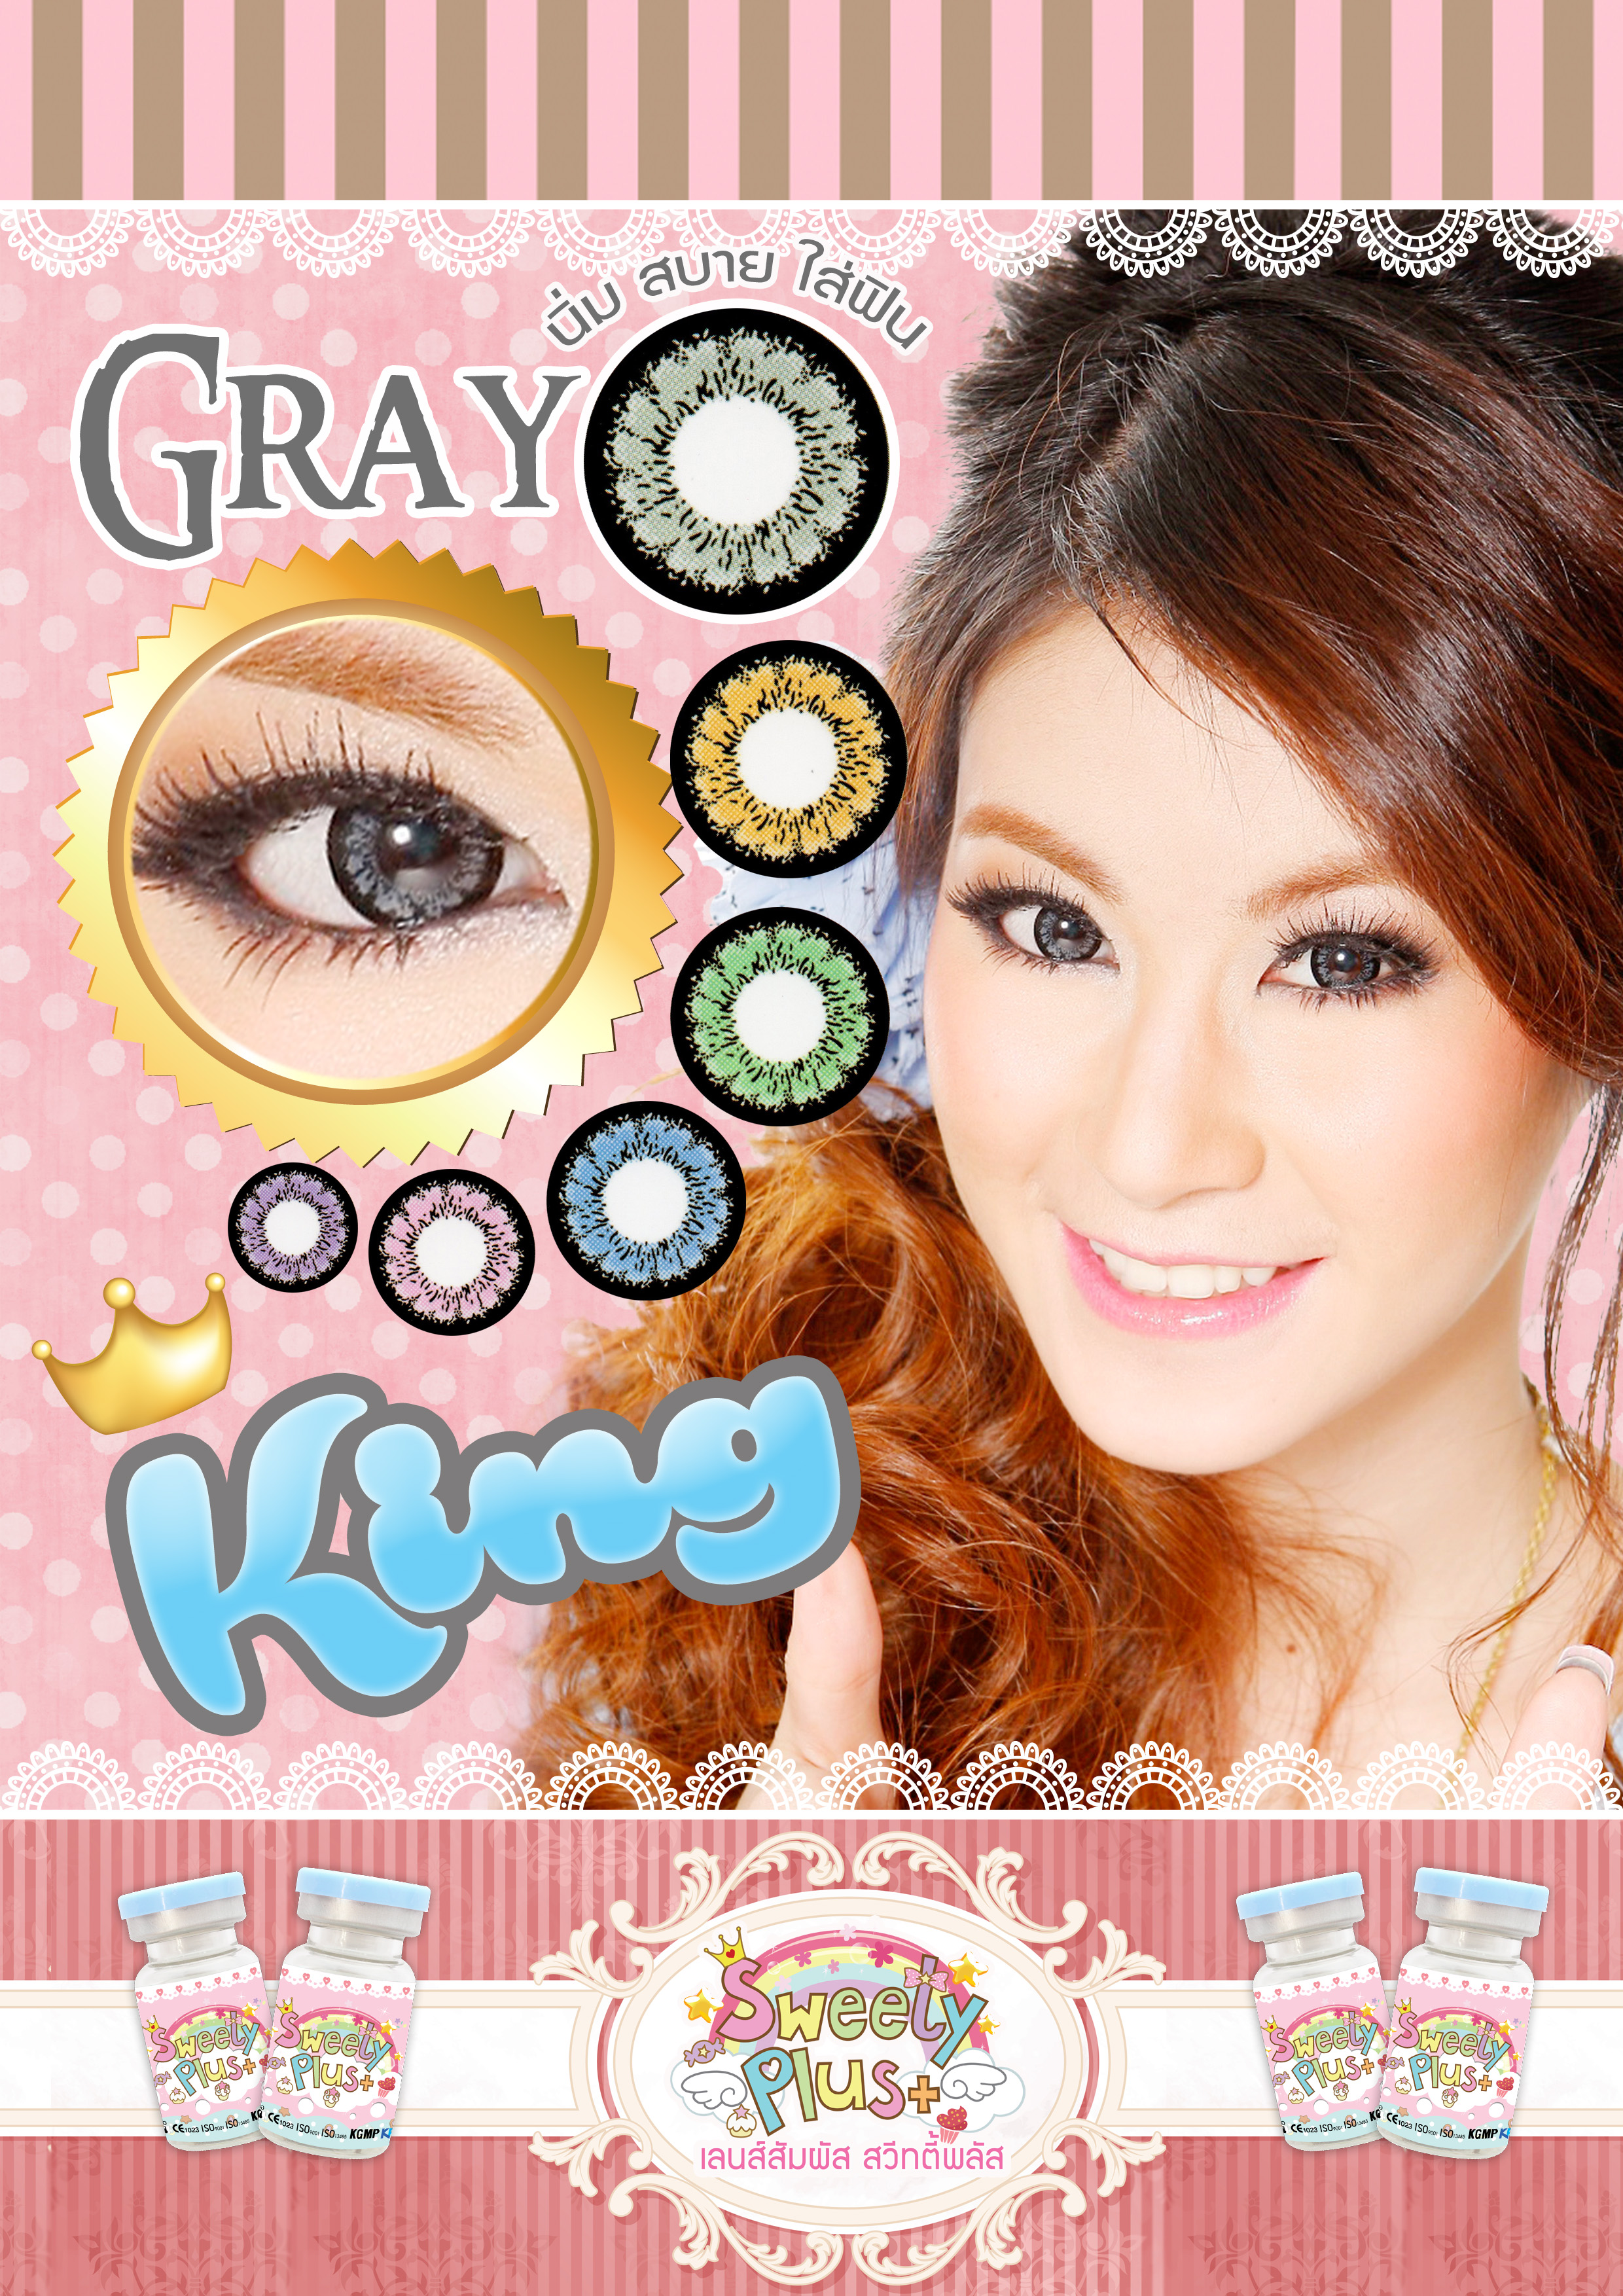 King-Gray